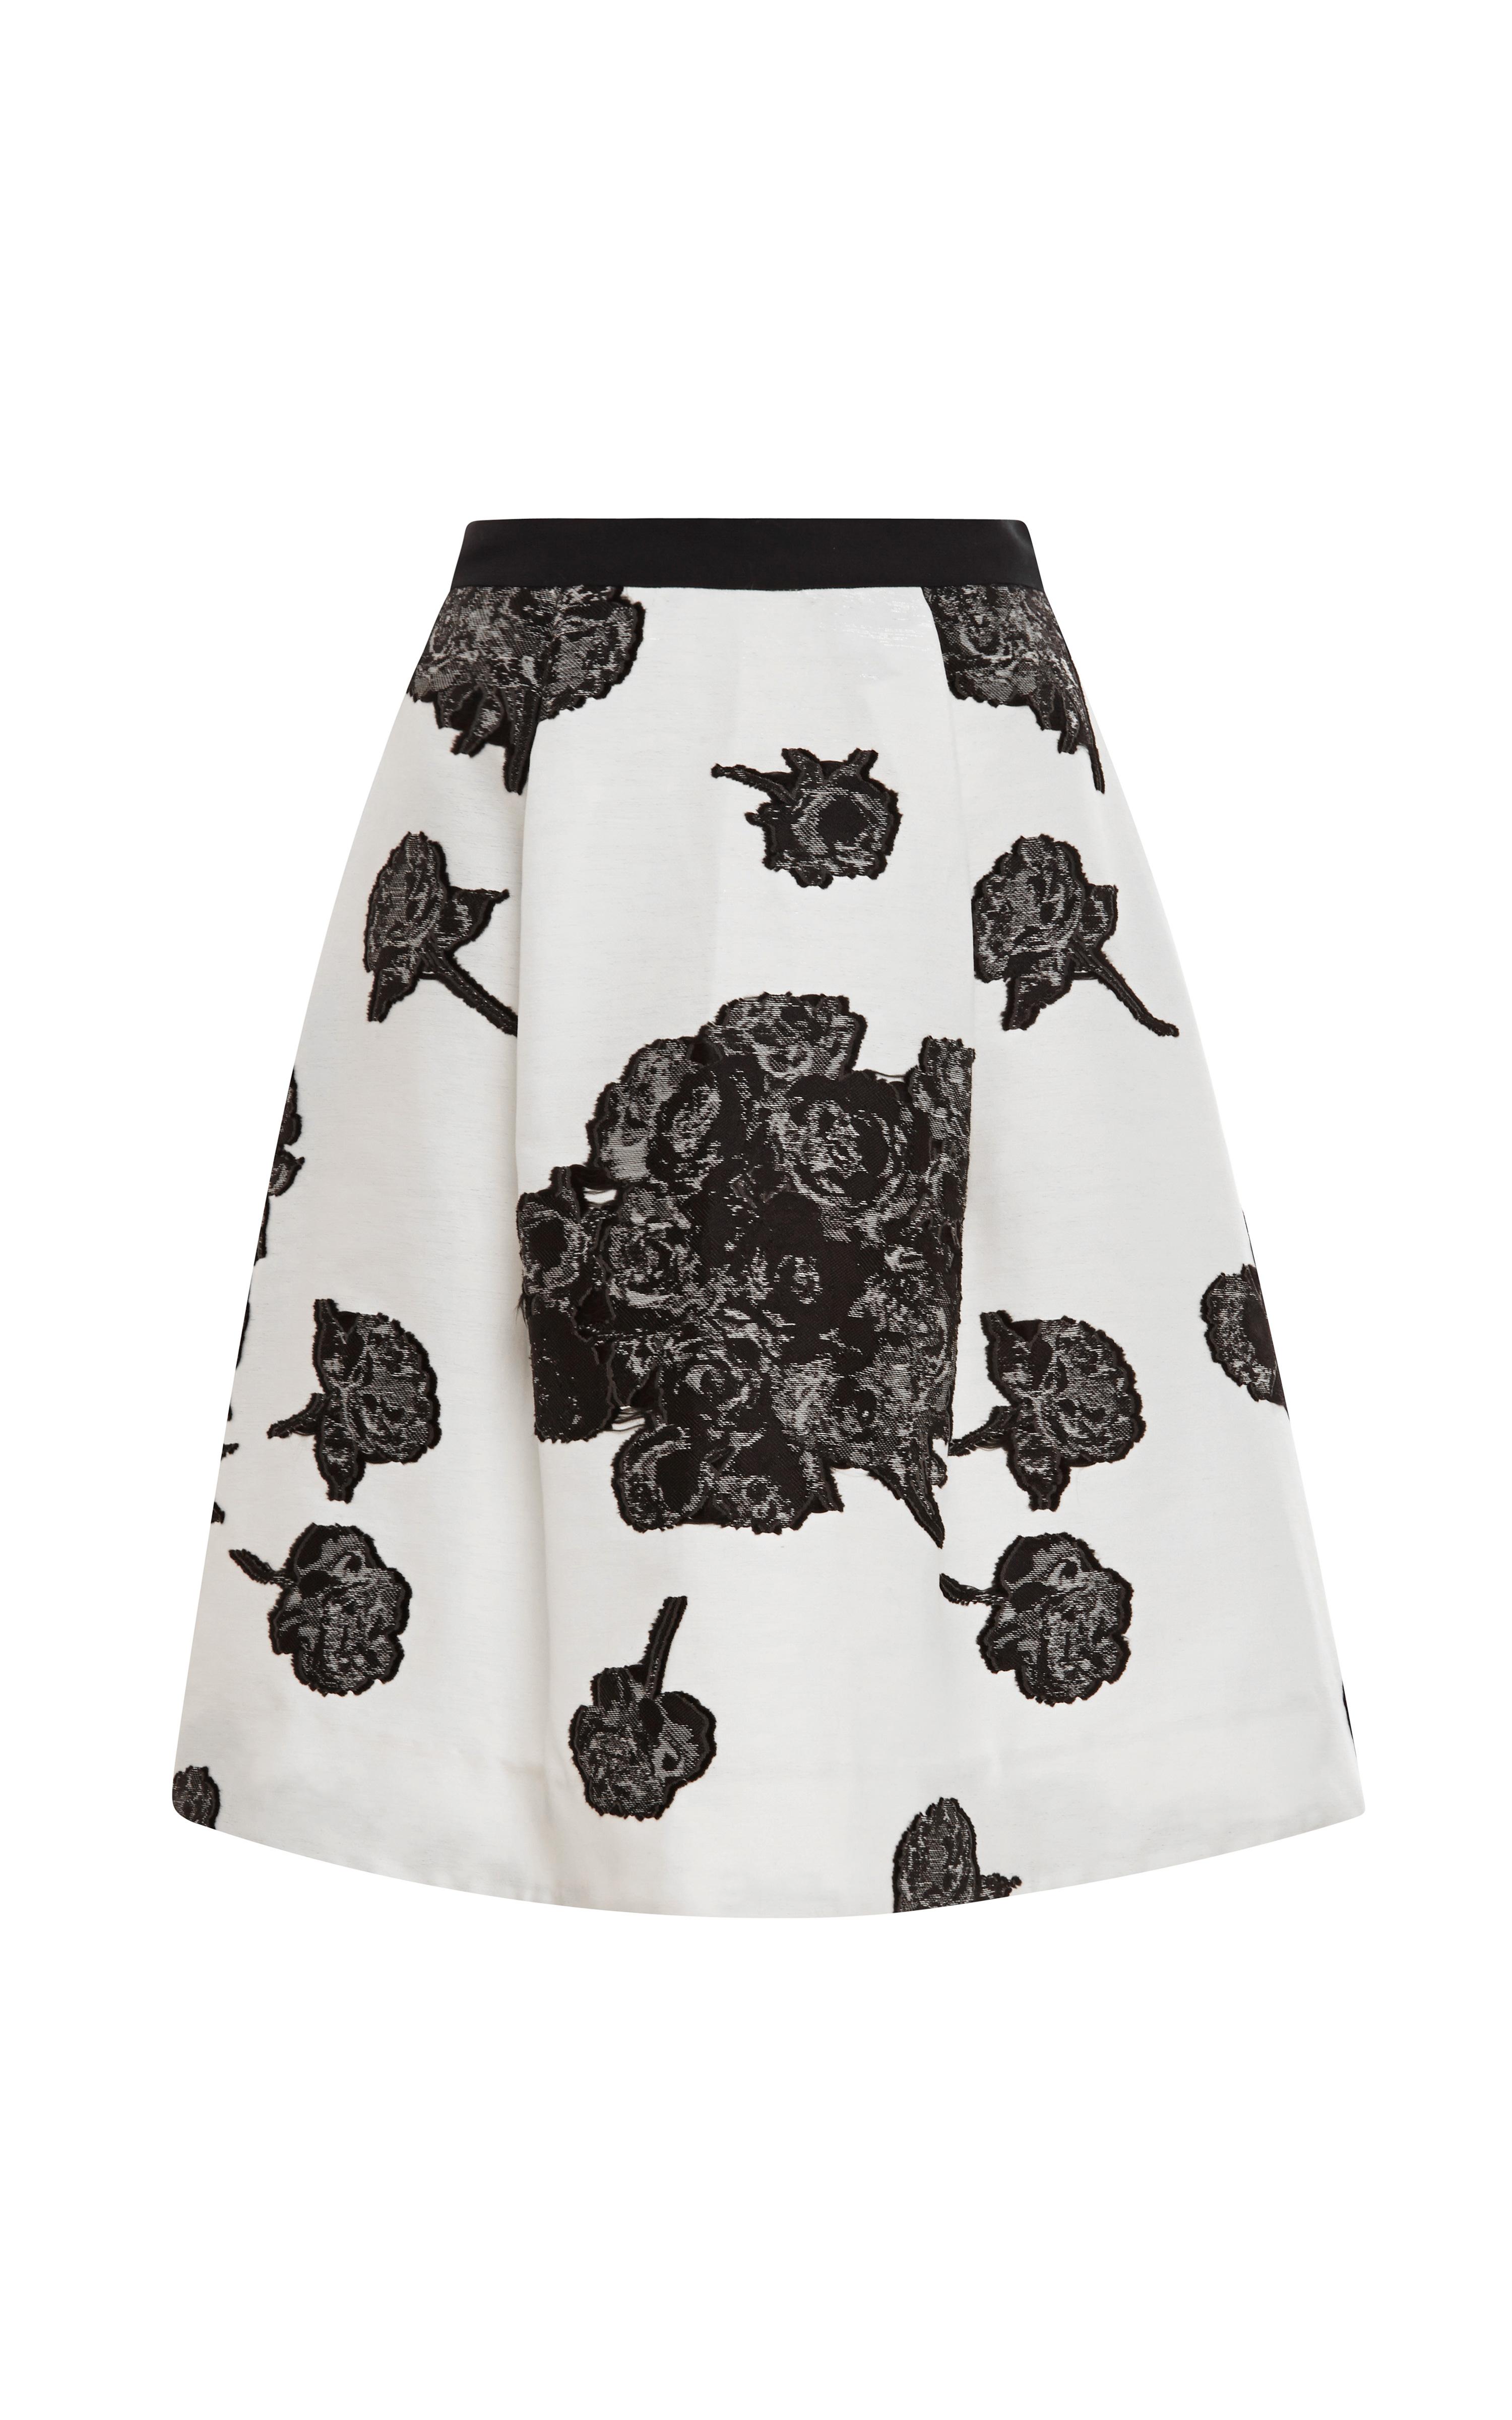 Ella Floral Jacquard Skirt by Tanya Taylor - Moda Operandi